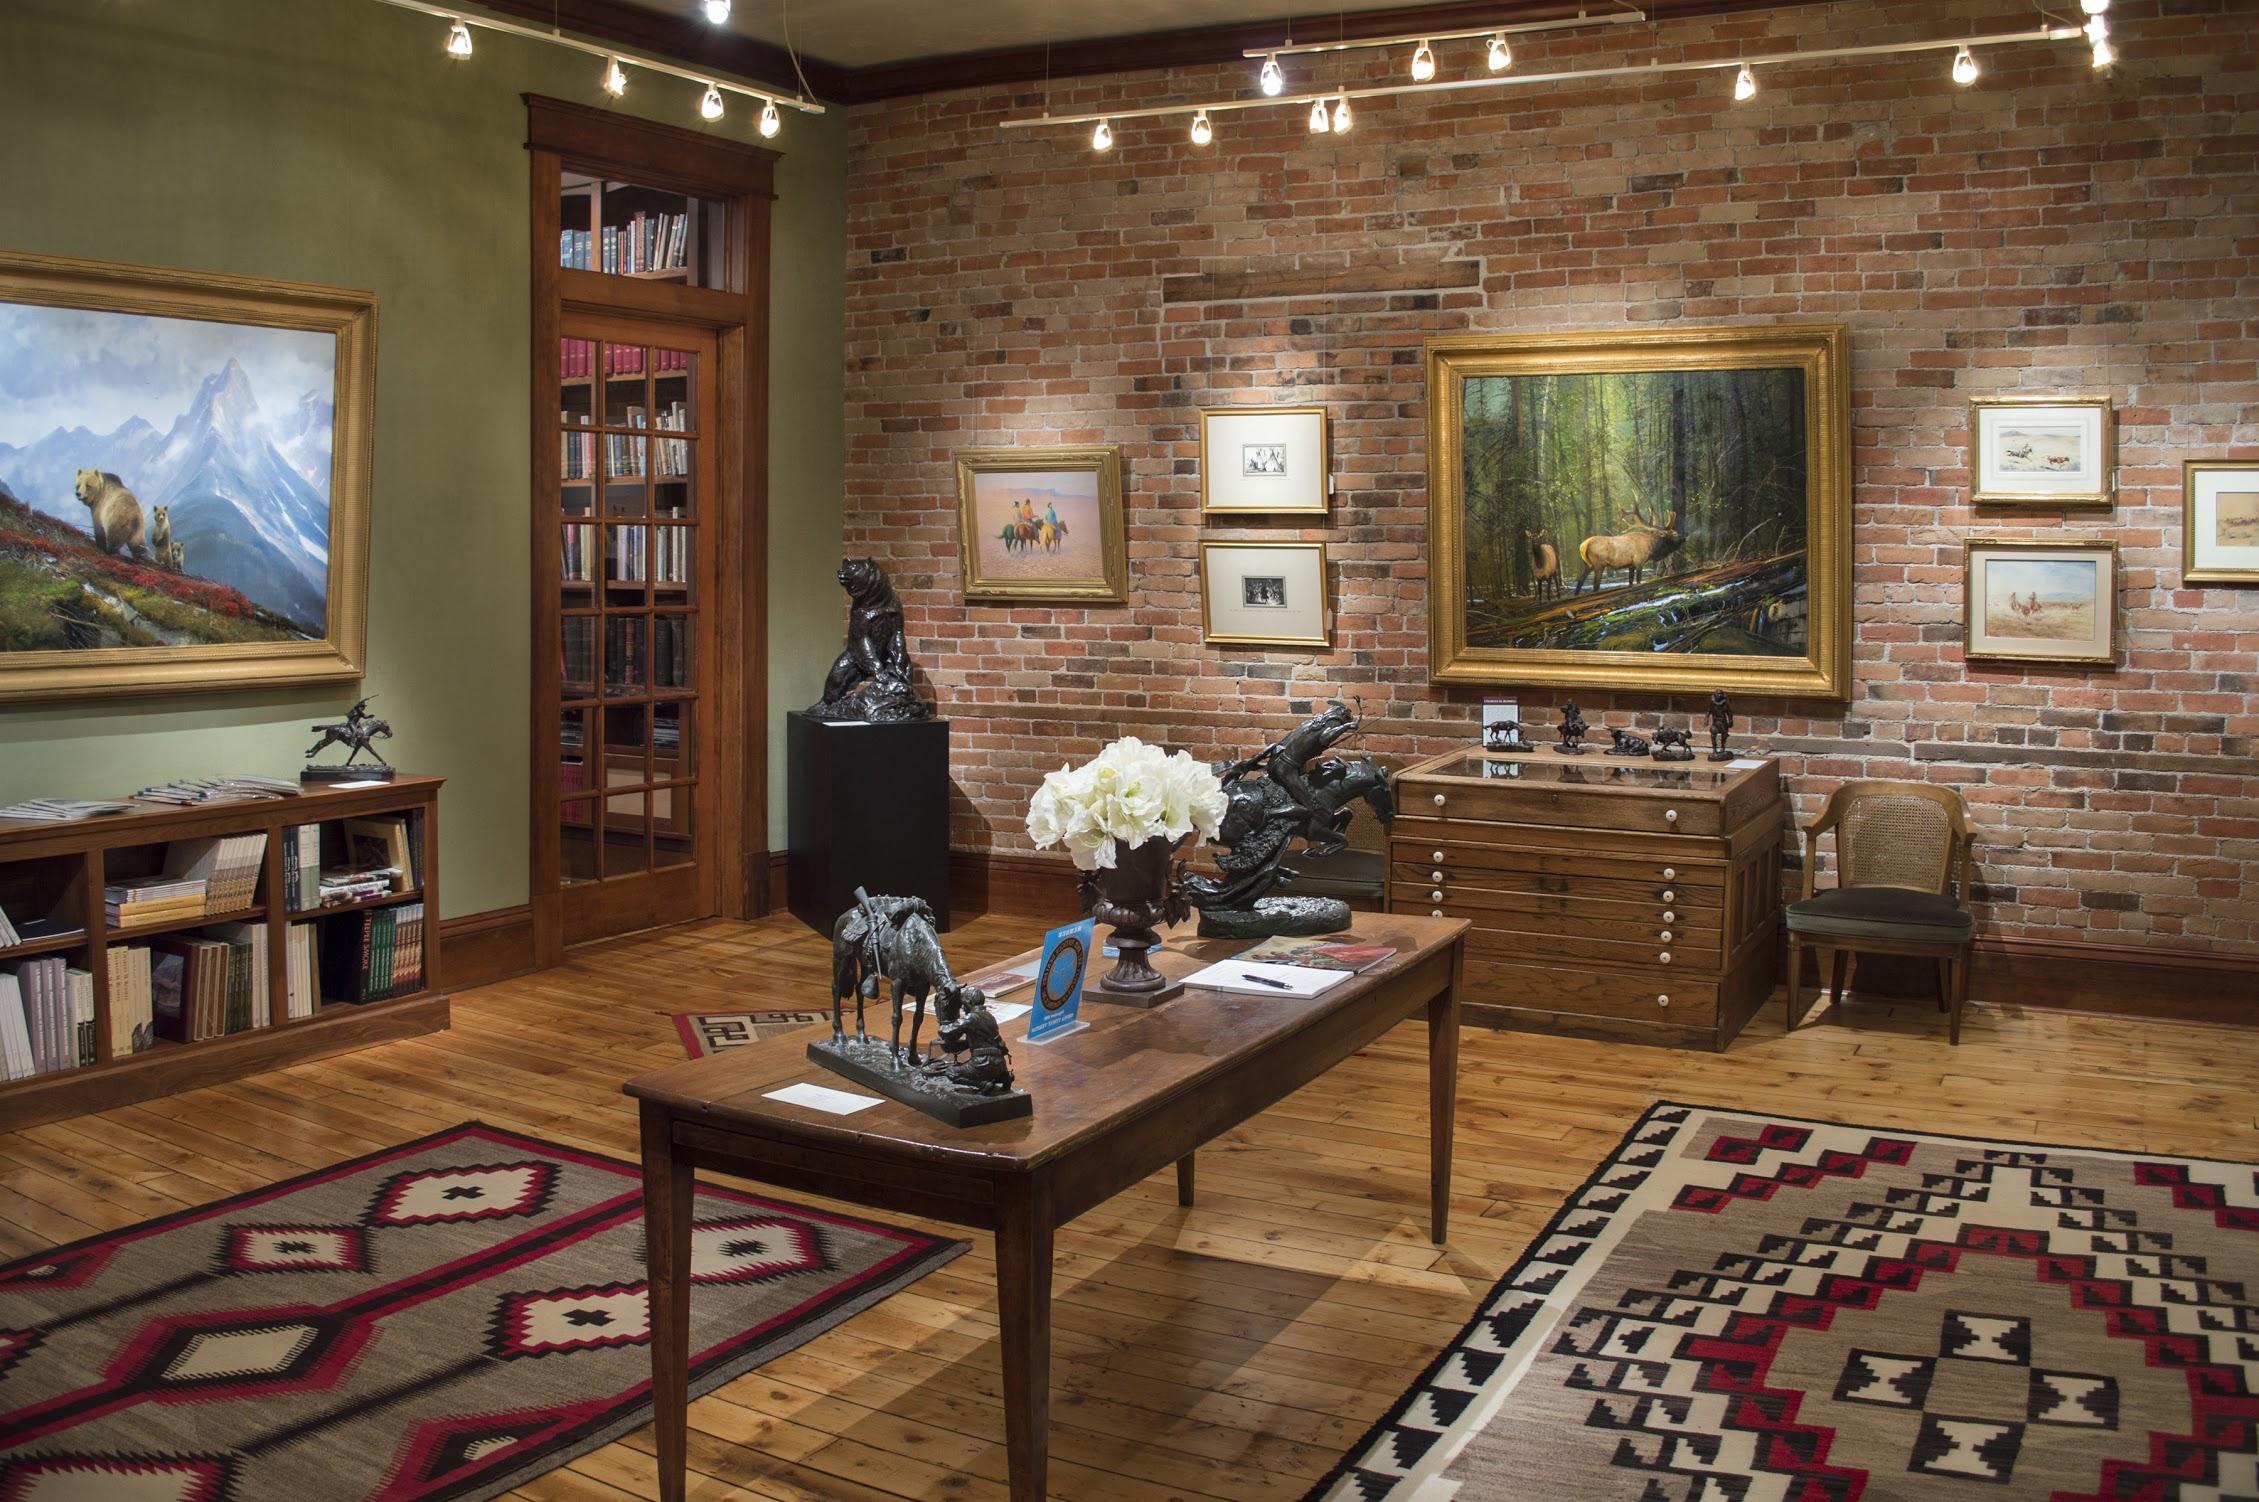 Nygard Gallery 1